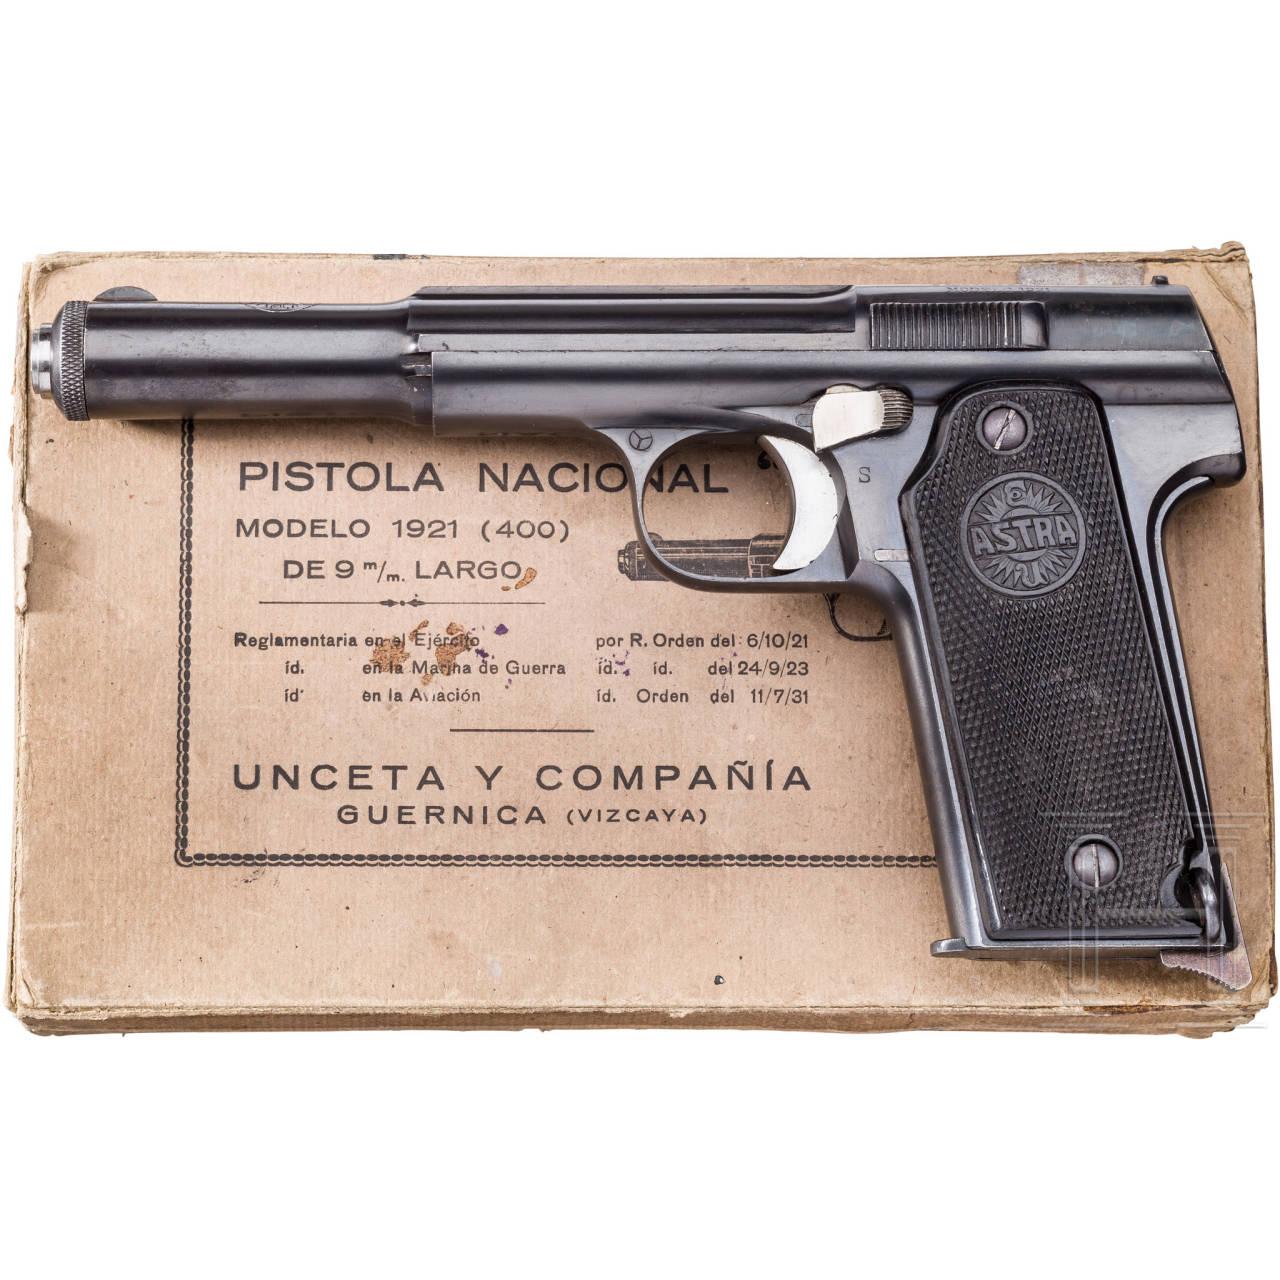 Astra Mod. 400 (1921), Typ I, im Karton